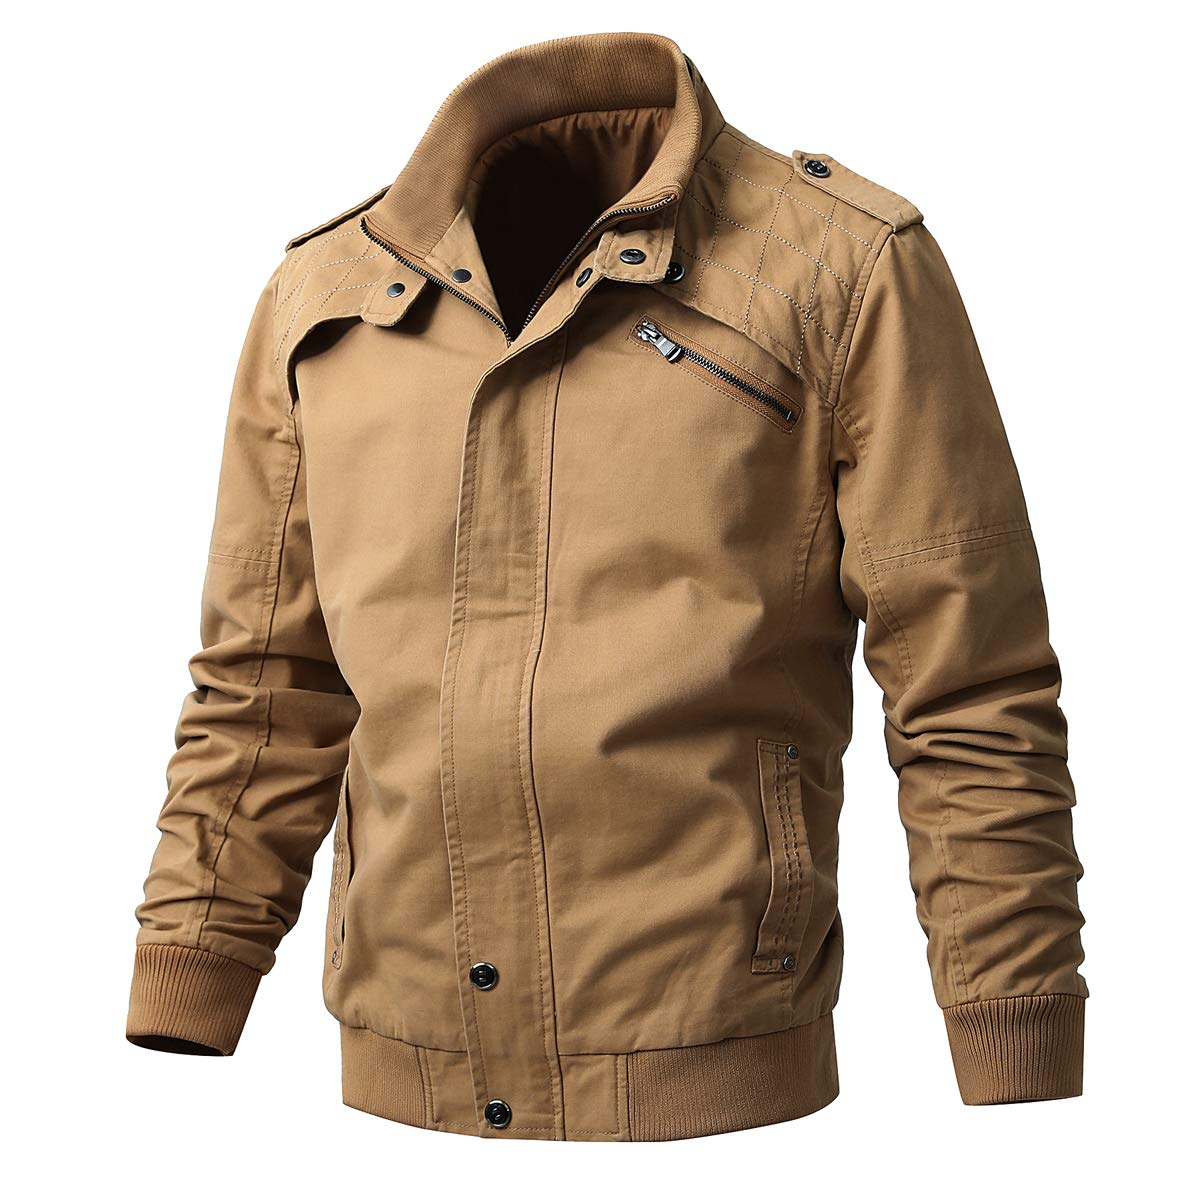 Men's Casual Winter Cotton Military Zip Jackets Windproof Outdoor Coat Windbreaker(JK1813Khaki-XL) by ZhaoDe